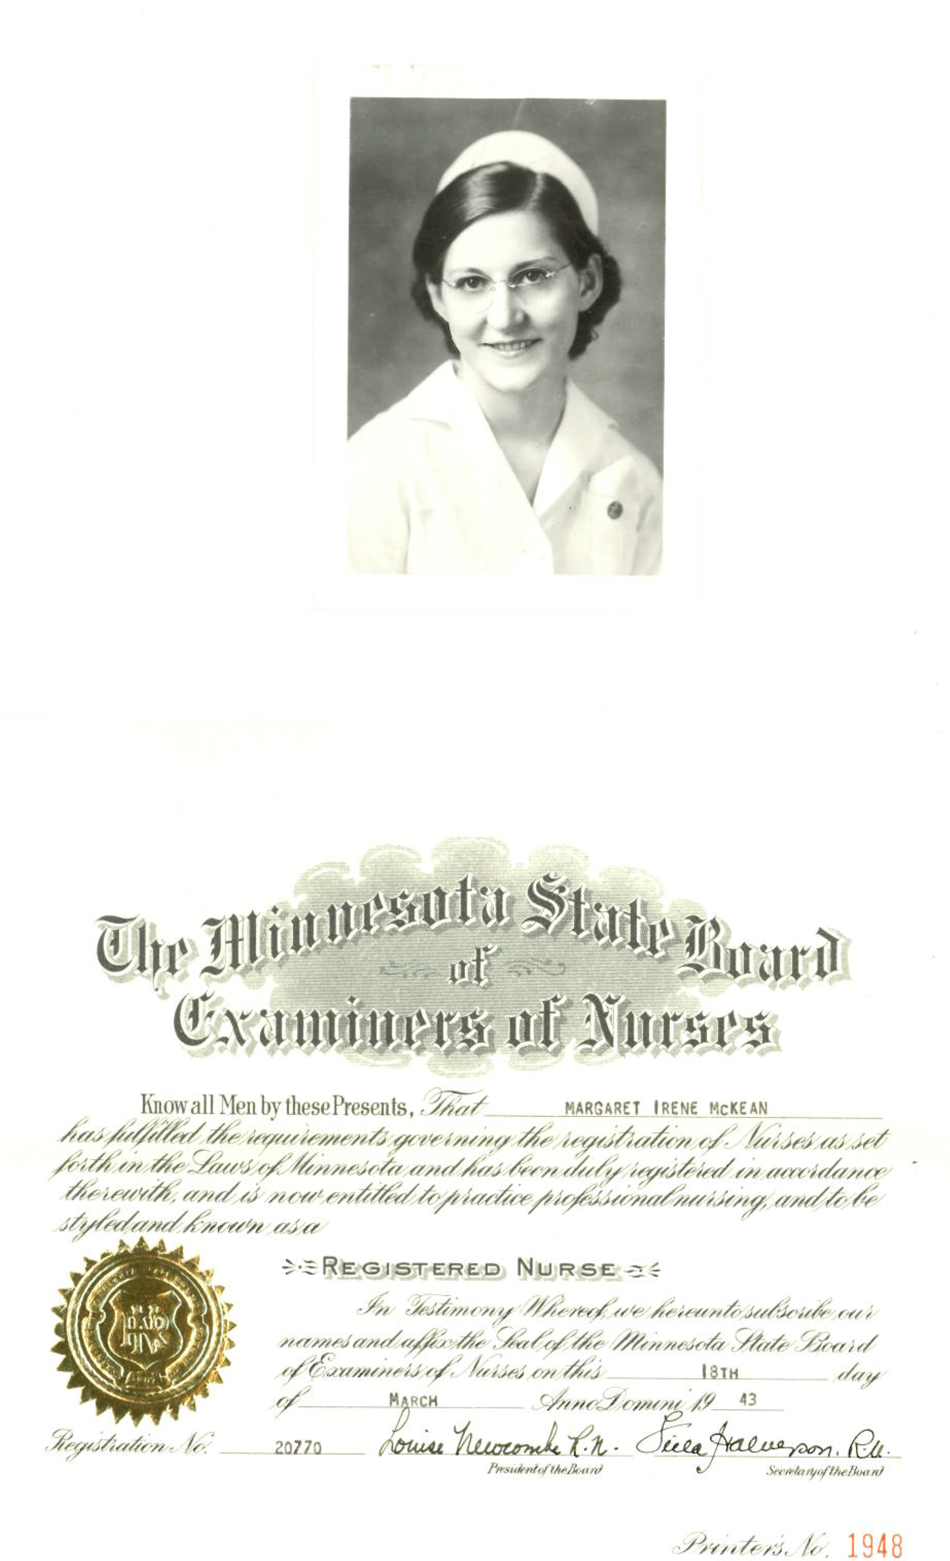 Irene McKean was born in Rosenberg,Texas and graduated